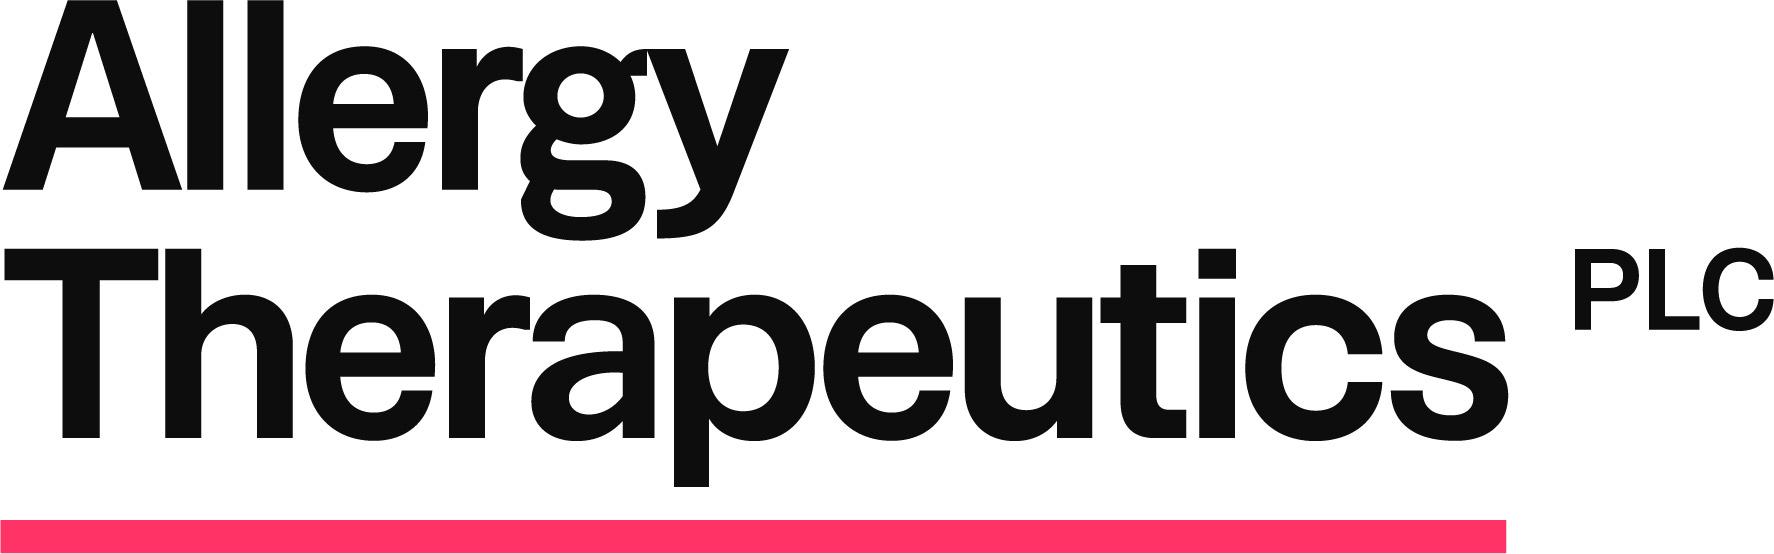 Allergy Therapeutics Plc Logo